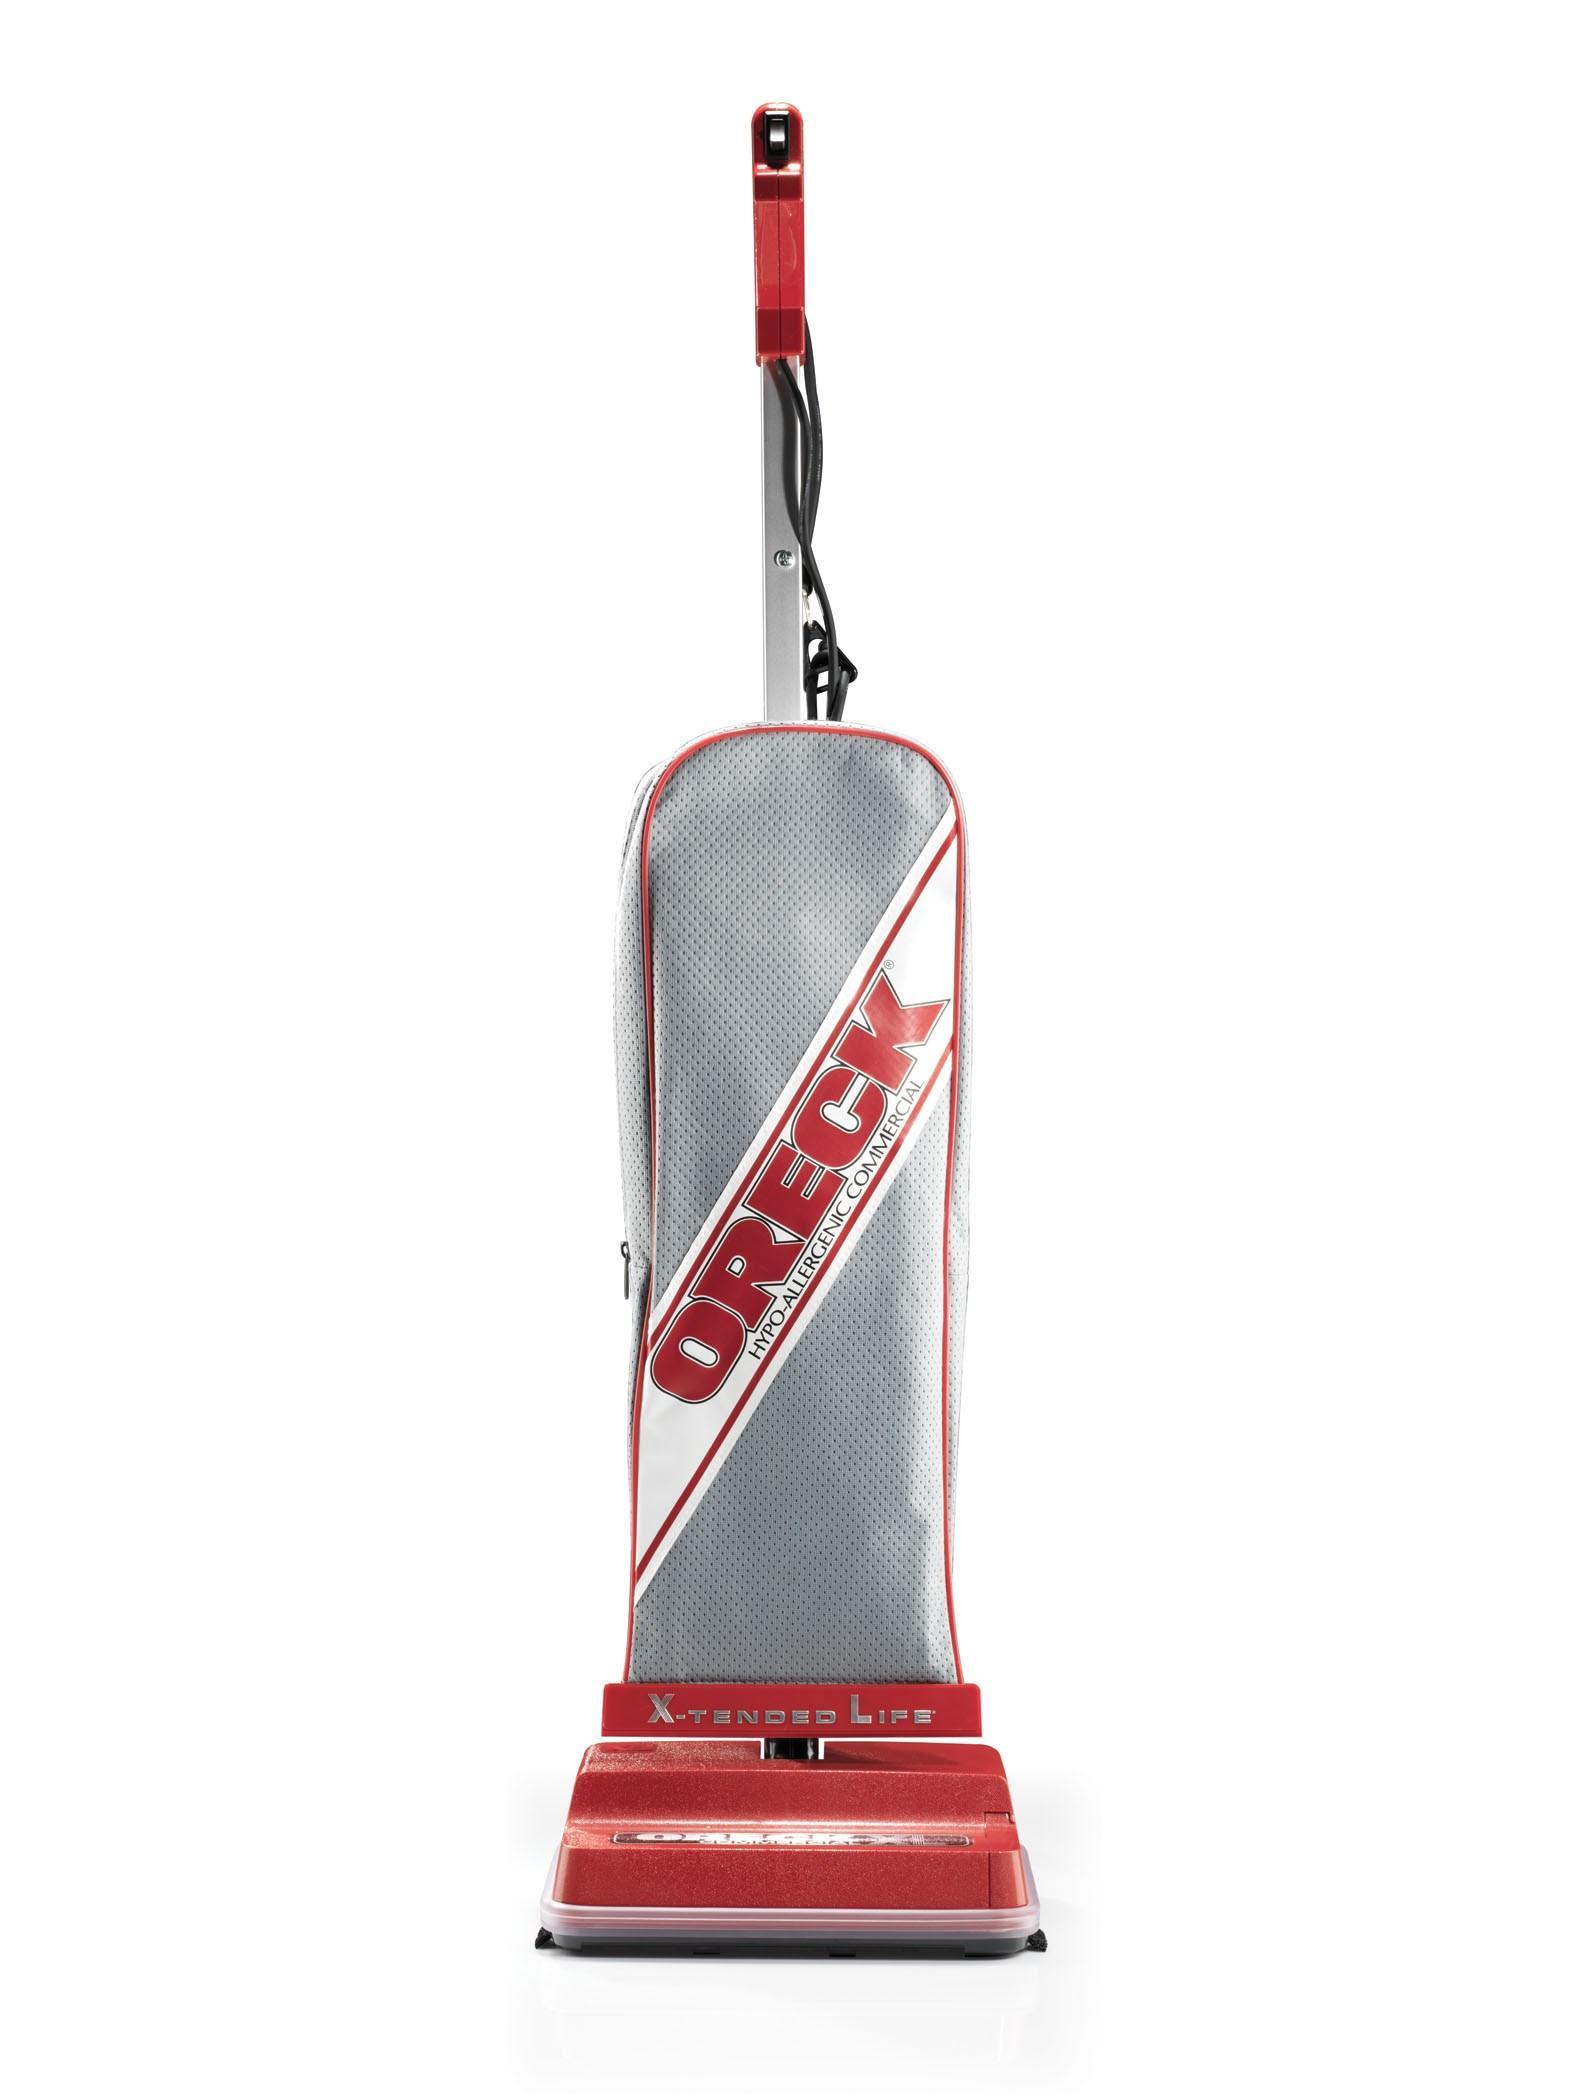 Oreck Commercial U2000h2 1 Upright Vacuum 9 Lb Amazon